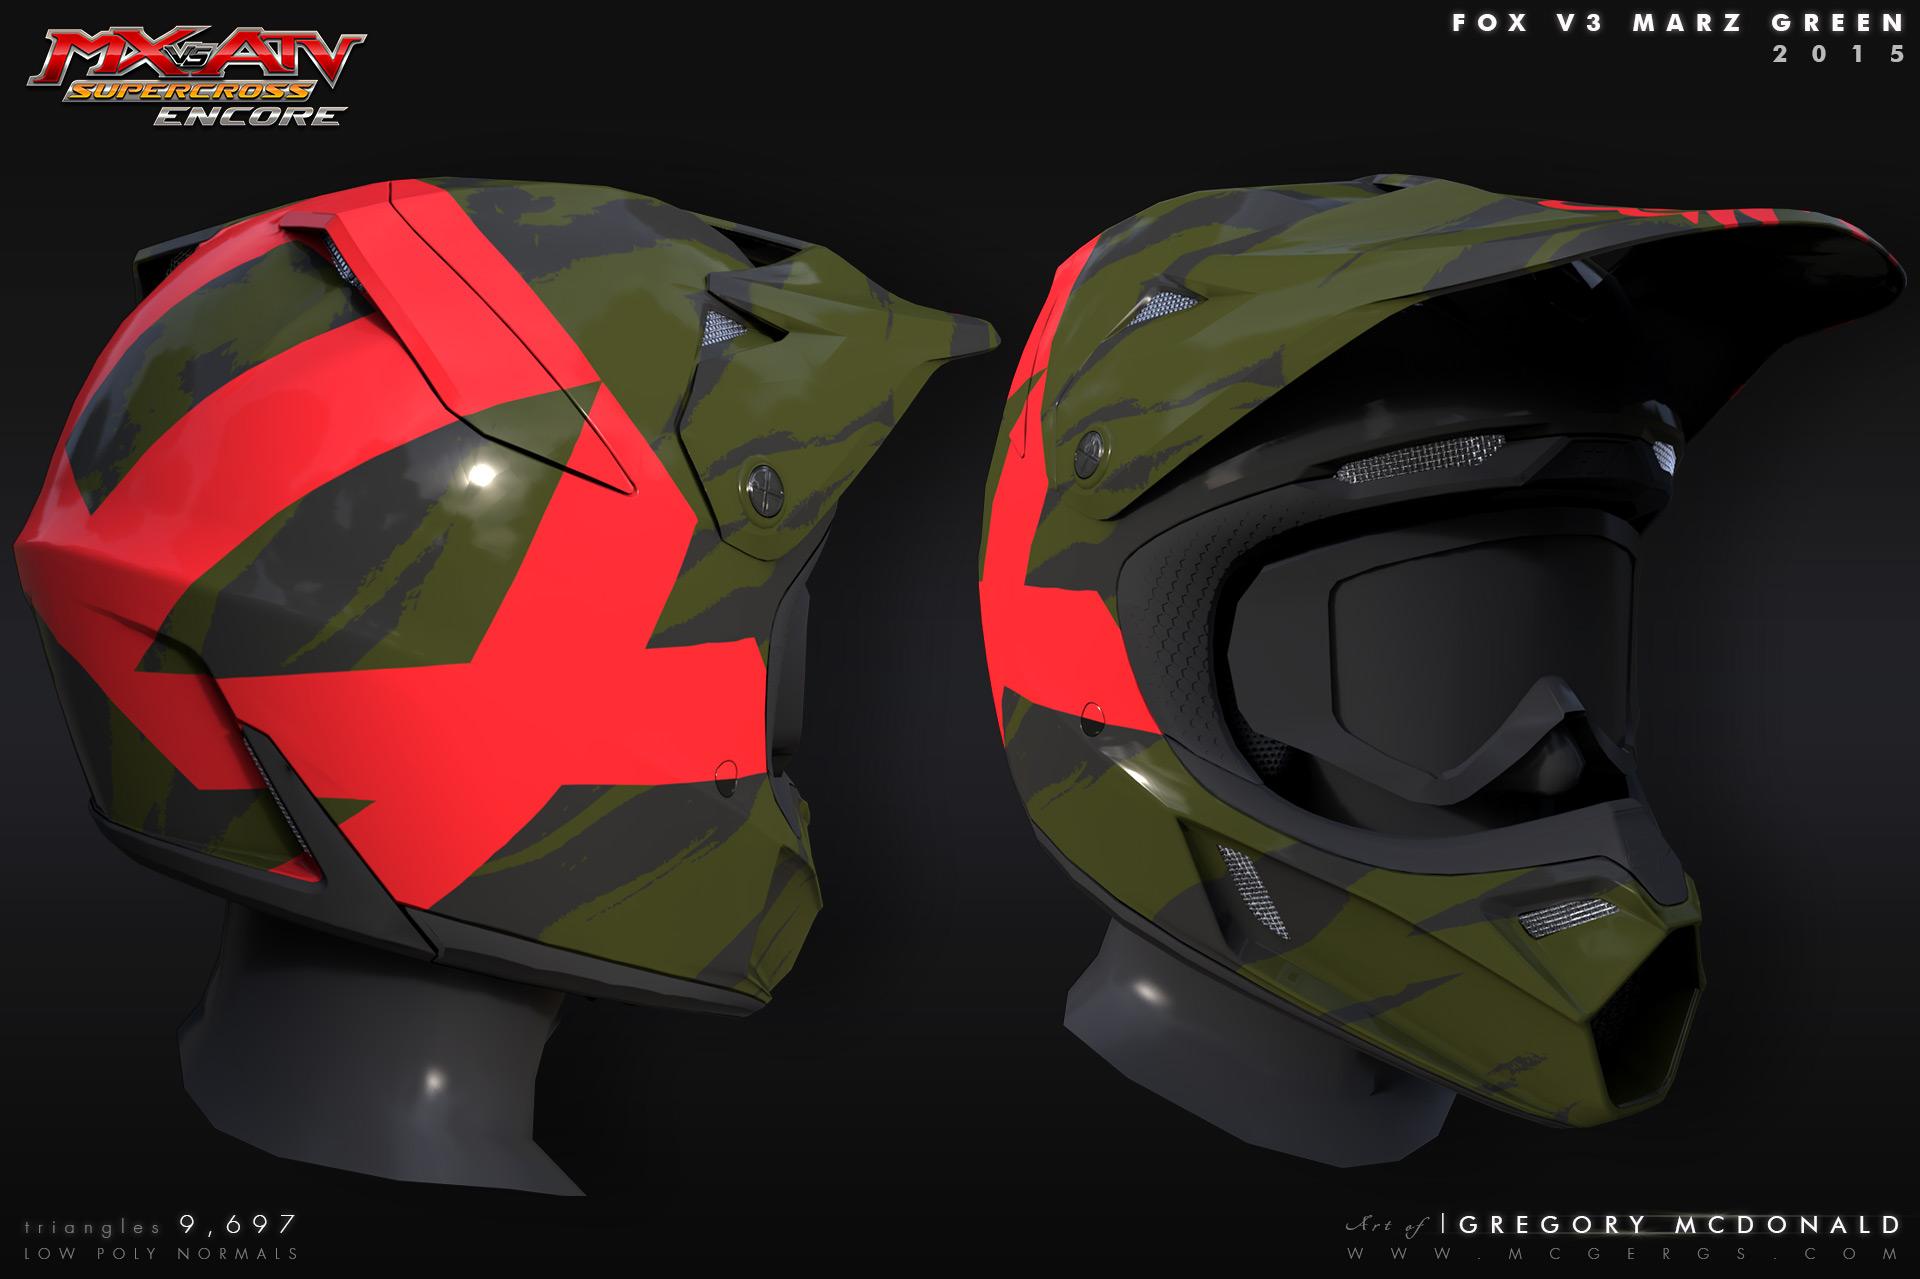 Helmet_FoxV3_Marz_Green